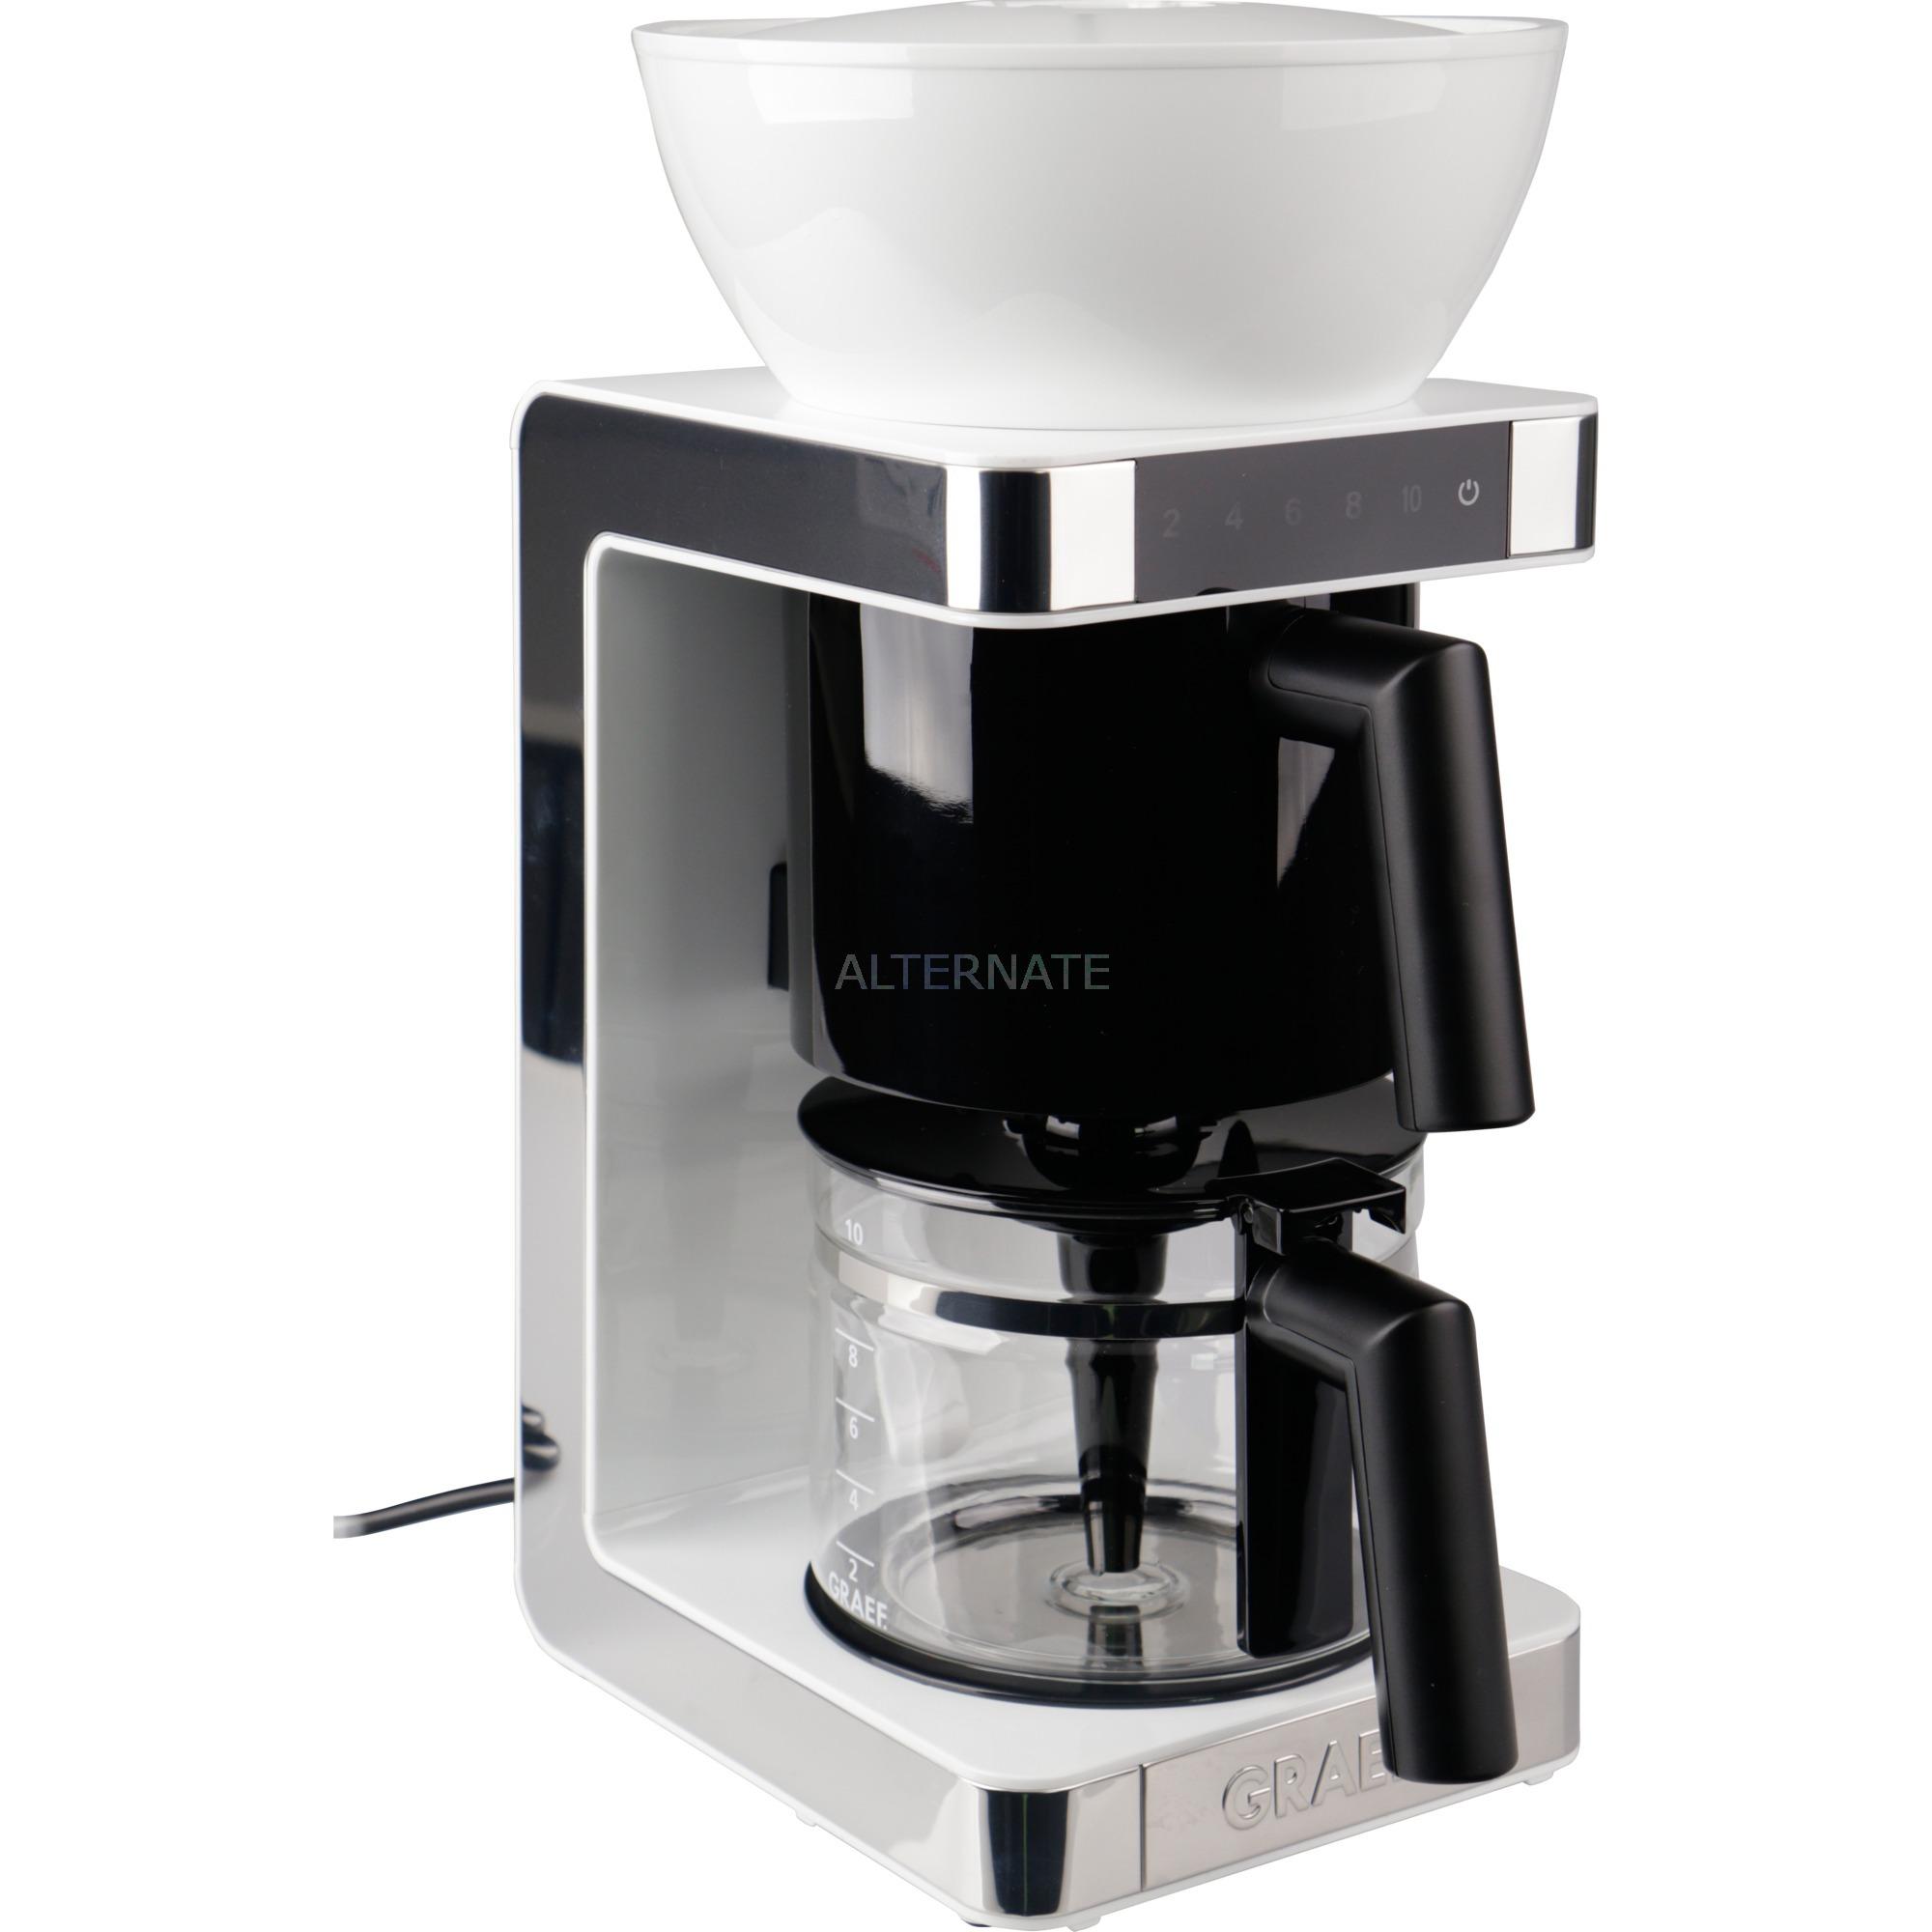 FK 701 Encimera Cafetera de filtro 1,25 L Semi-automática